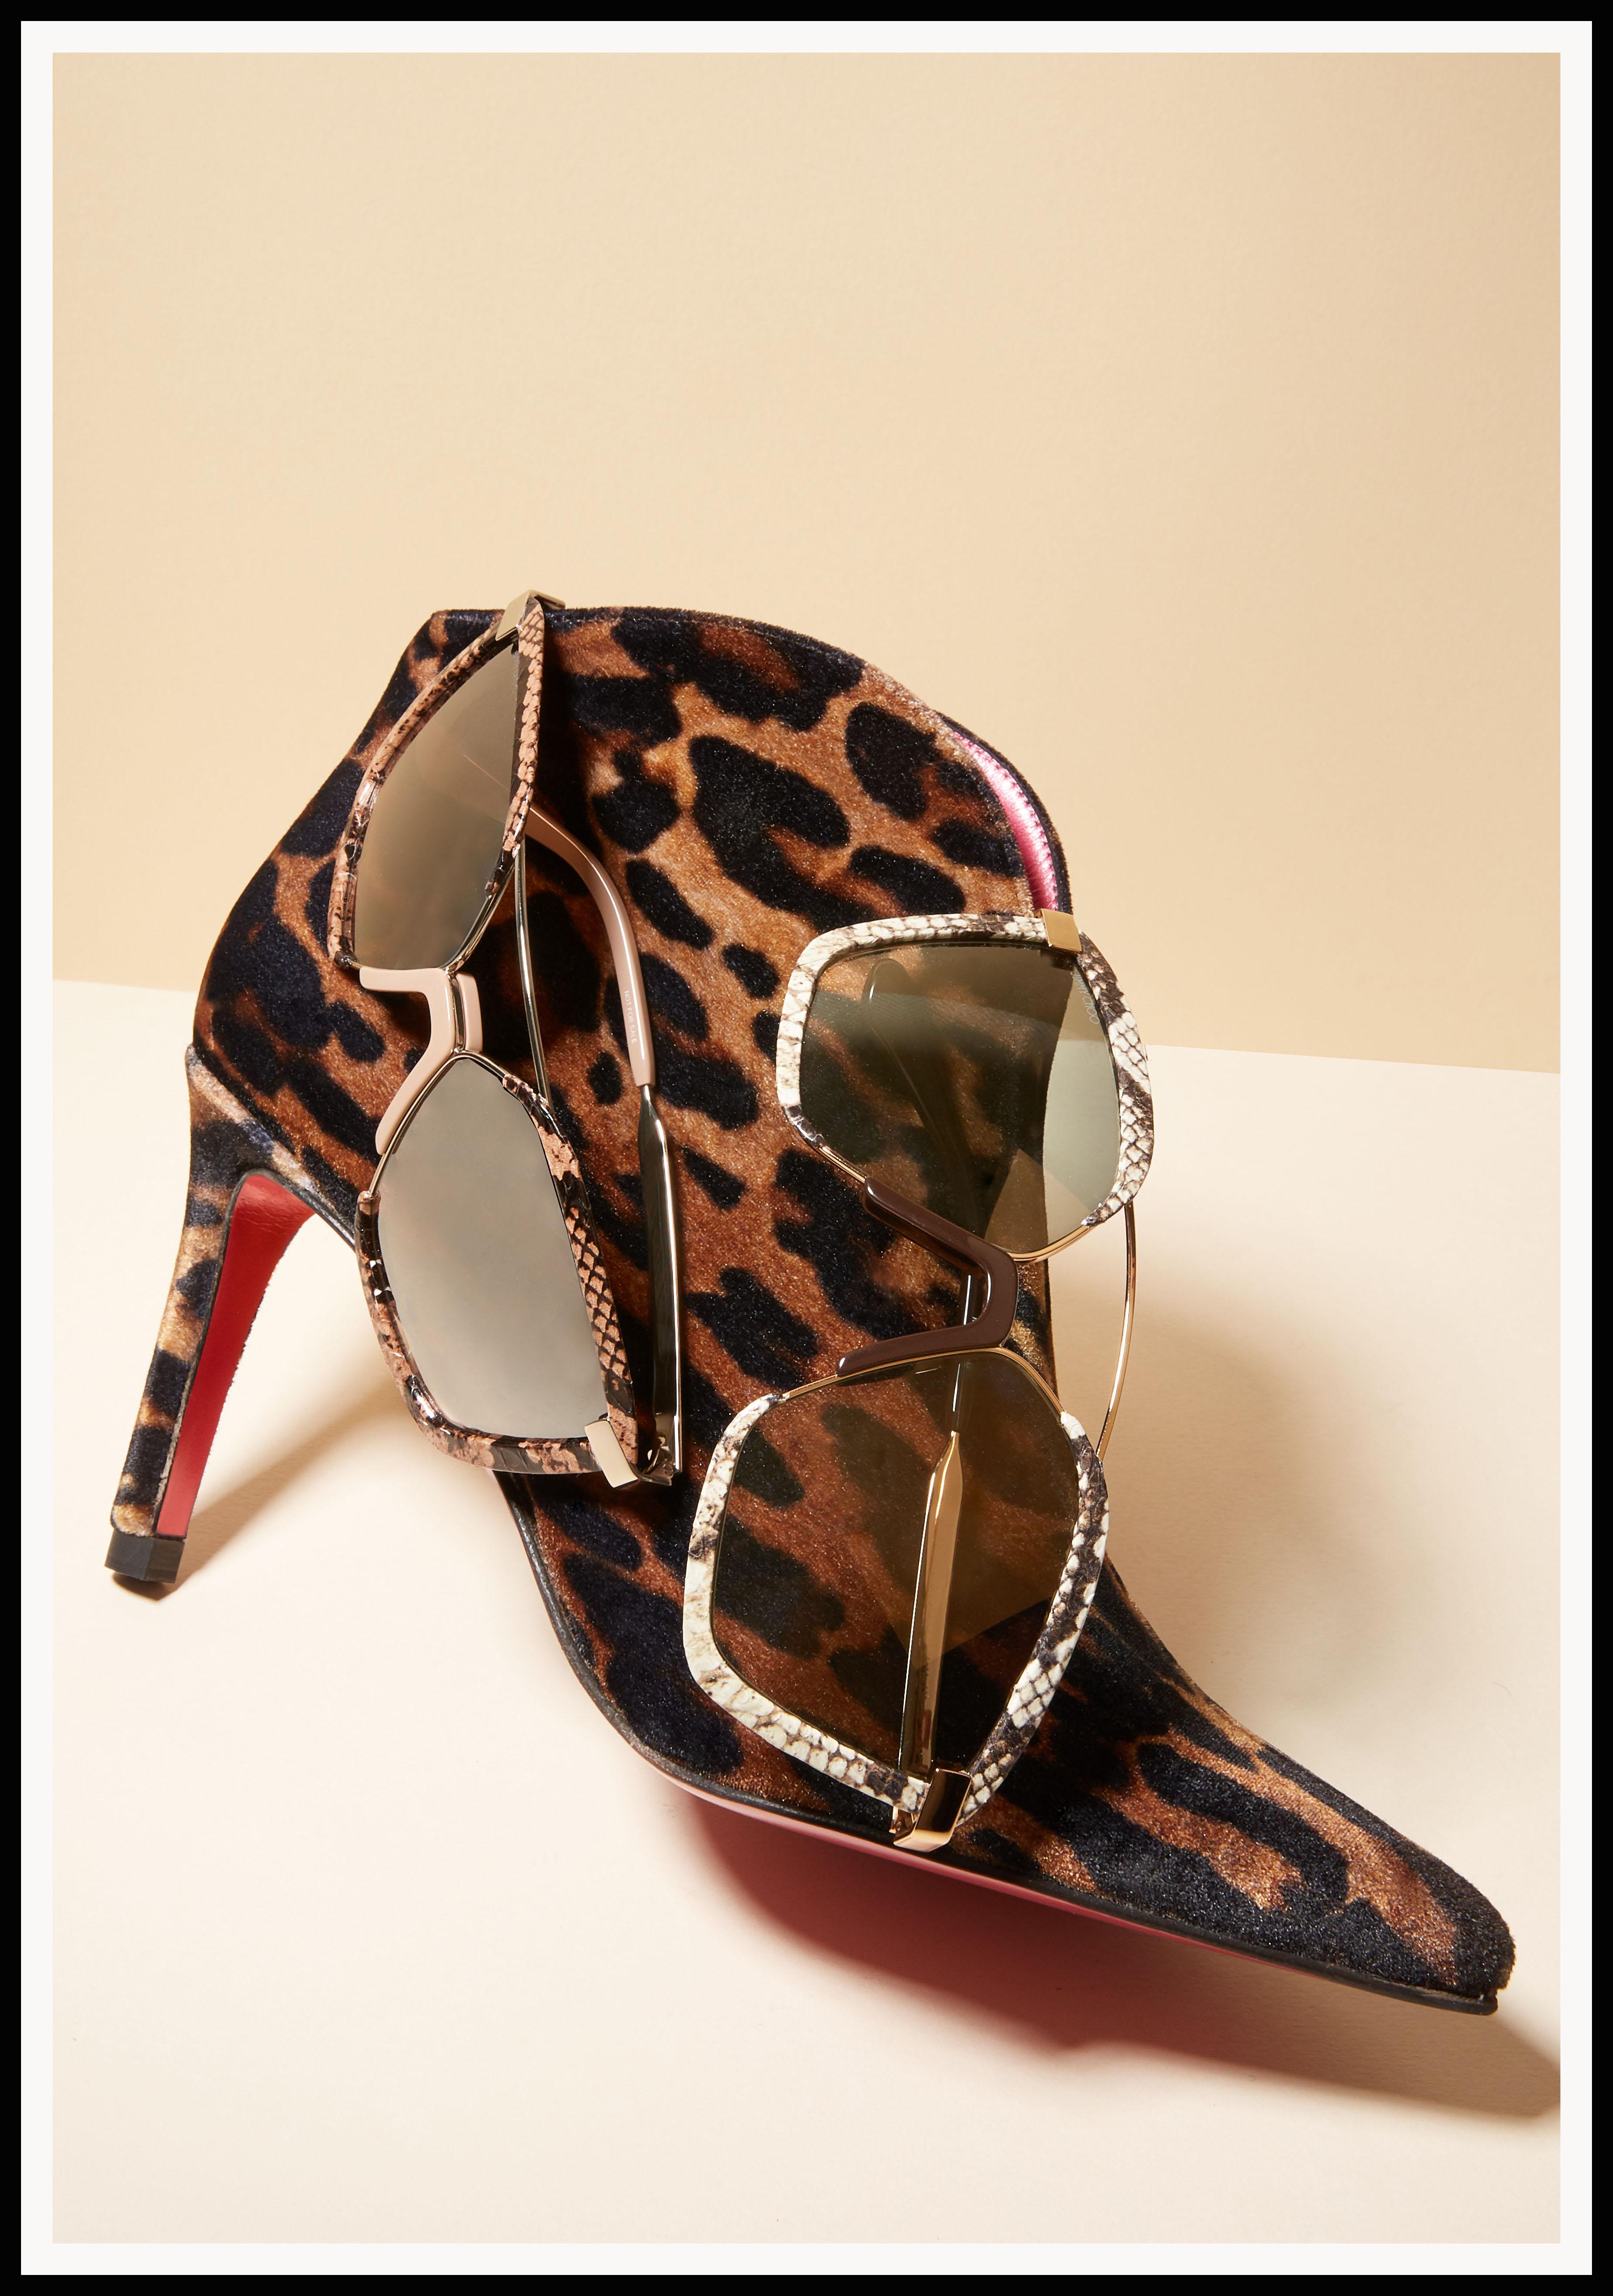 Botin con estampado de leopardo de Mascaró. Gafas de pitón de Jimmy Choo.